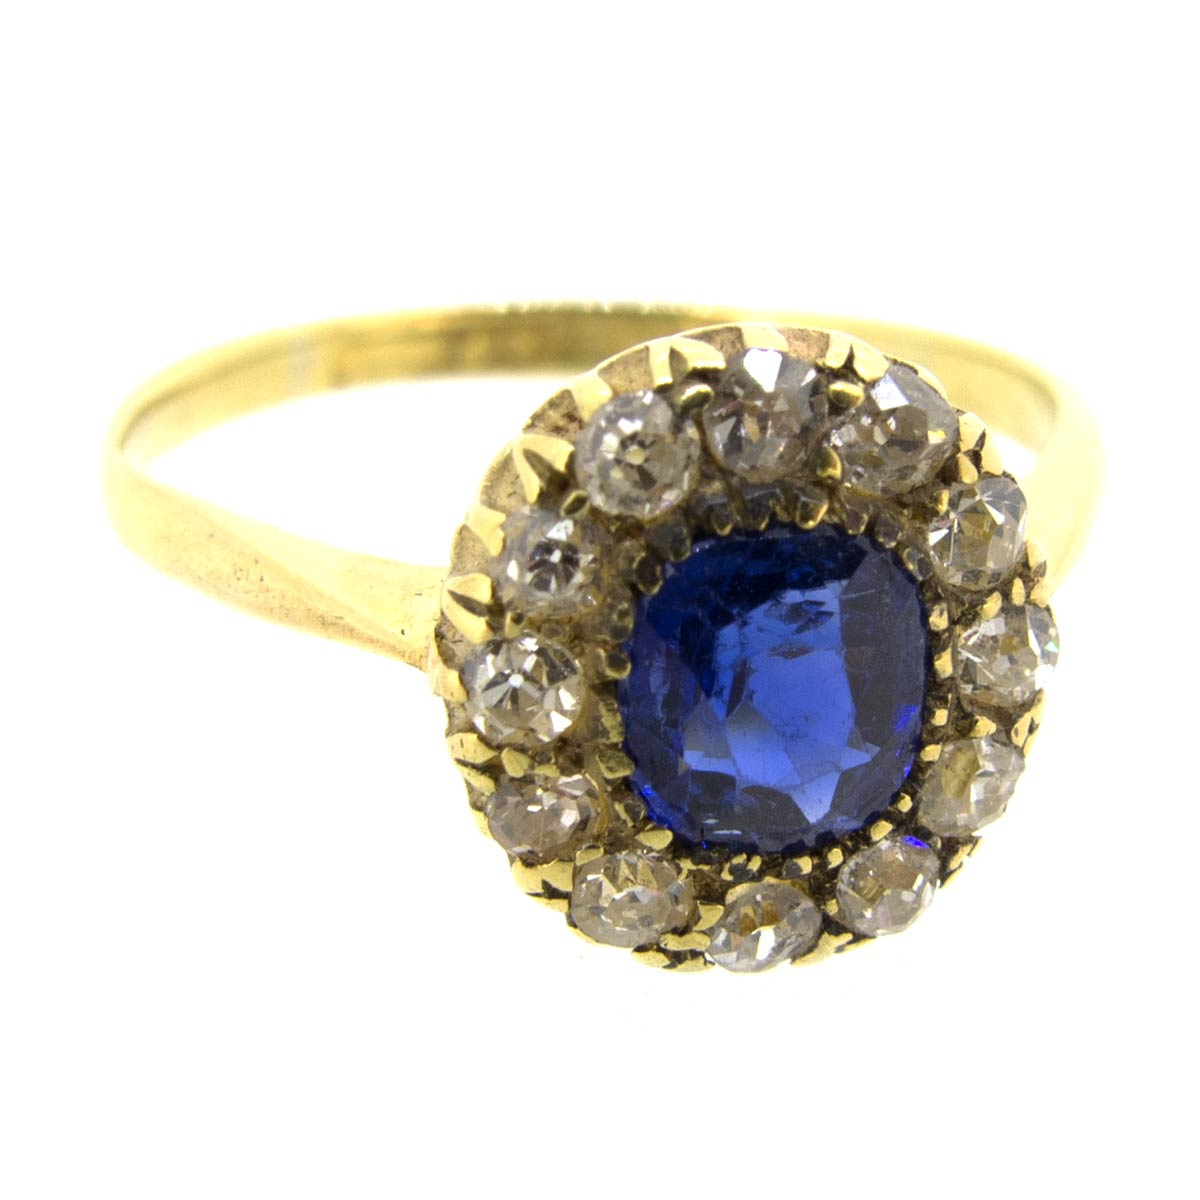 Russian Wedding Ring Hatton Garden